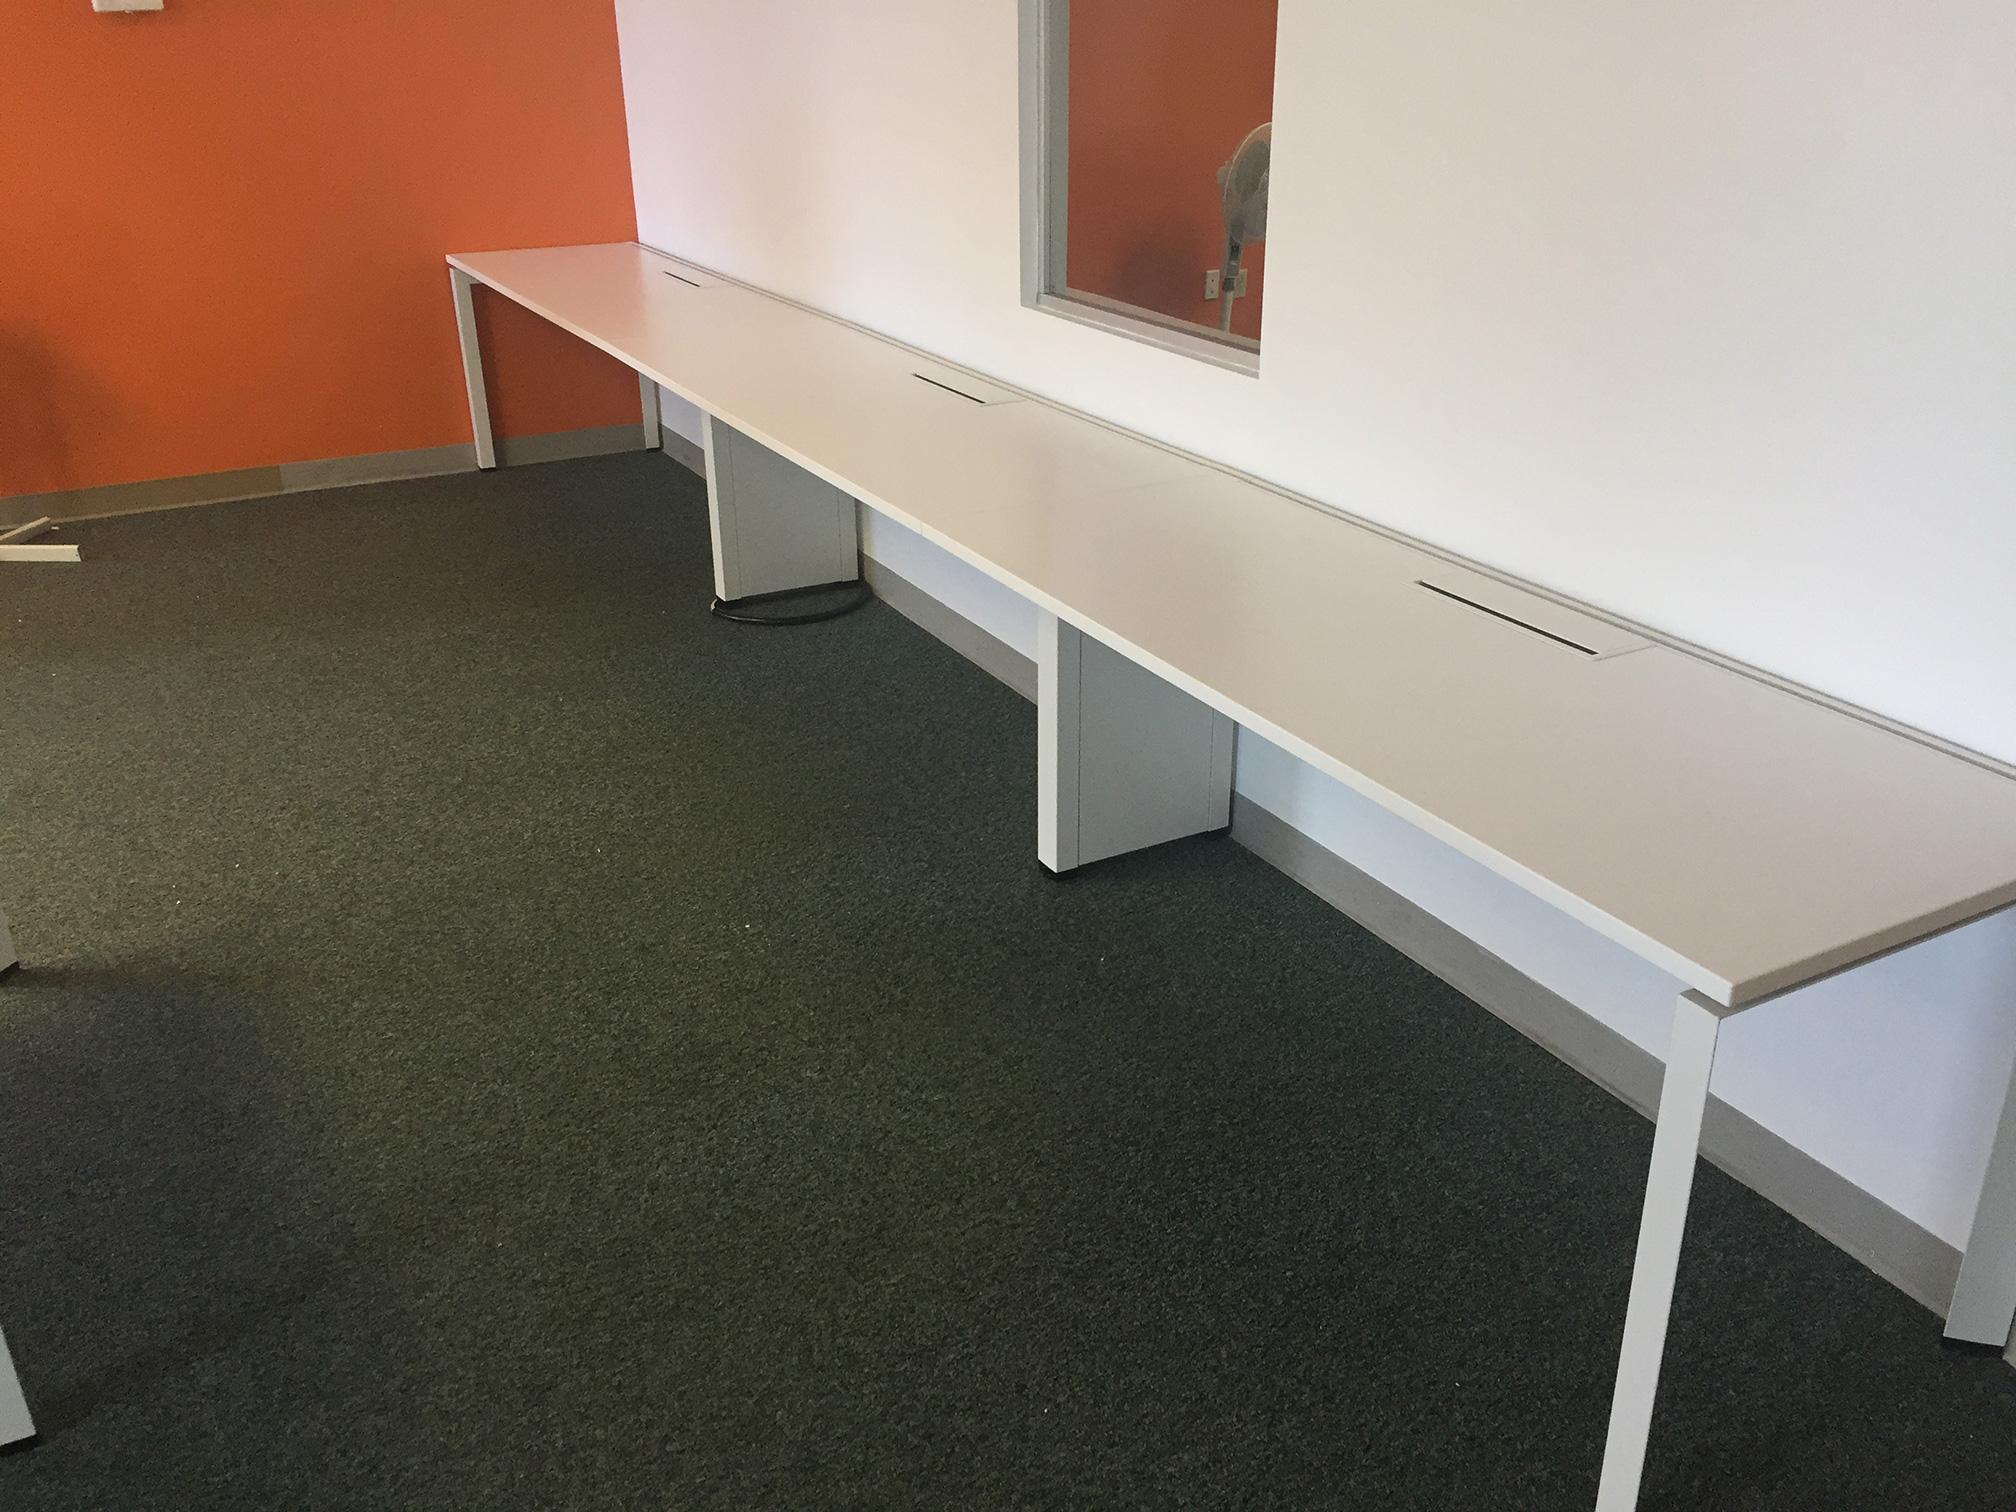 collabrative-office-systems-manasota-office-supplies-llc.jpg